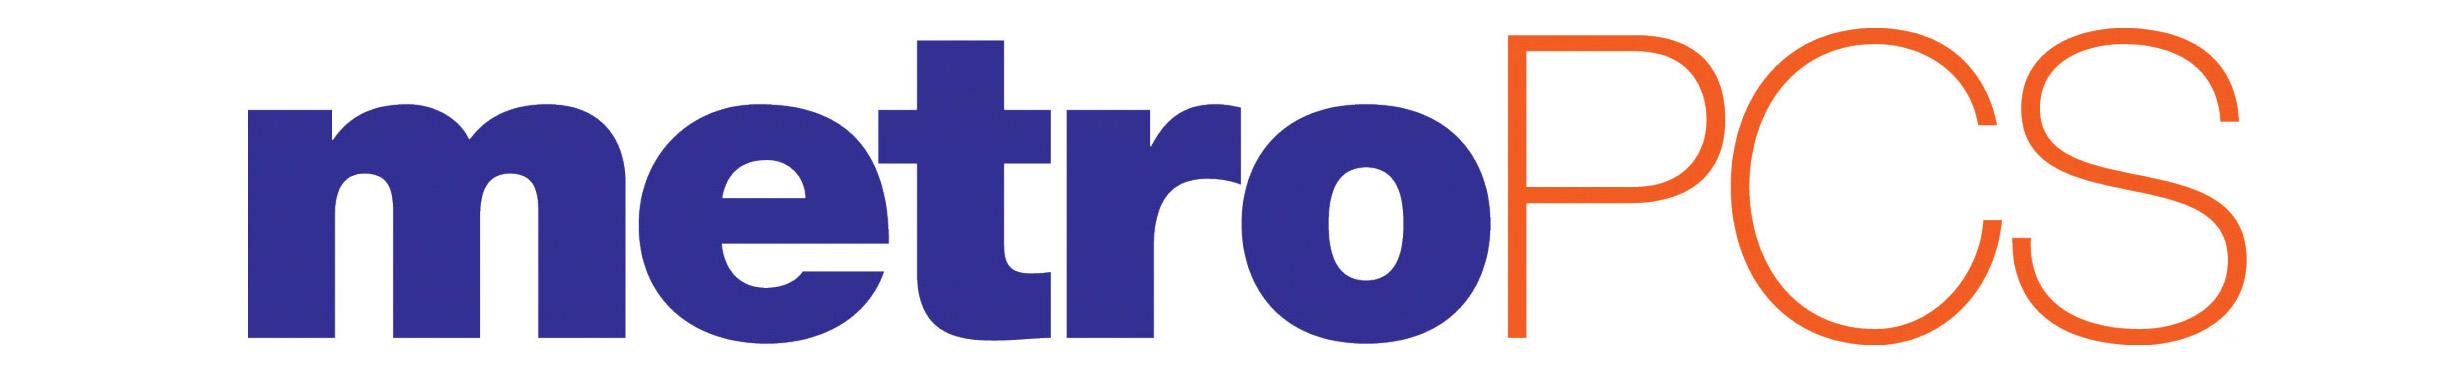 metroPCS_resizecopy.jpg